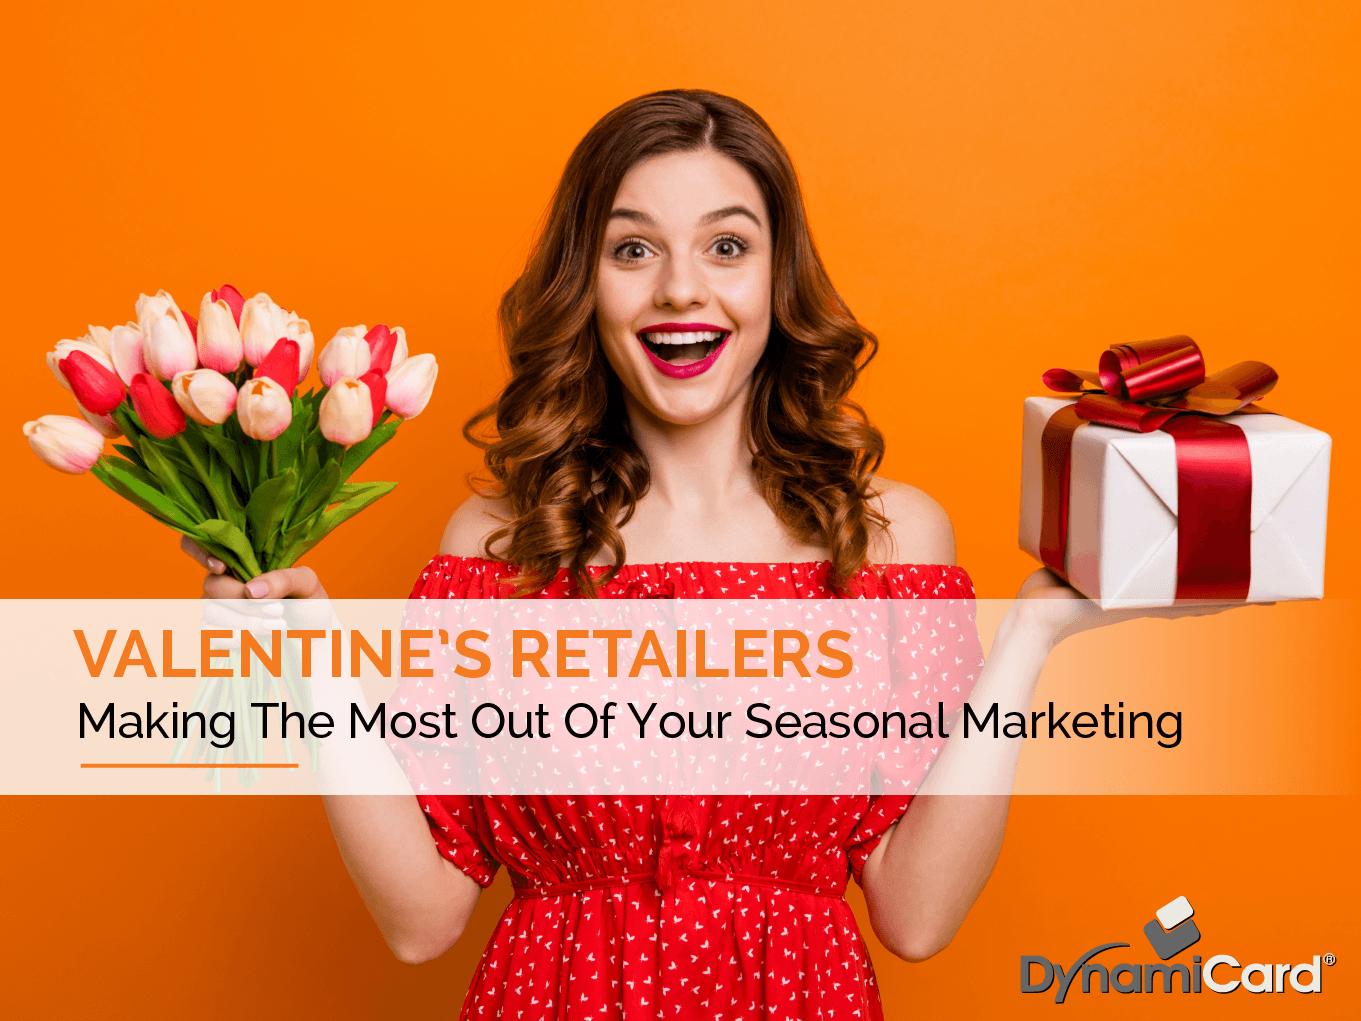 Valentine's Day Retailers